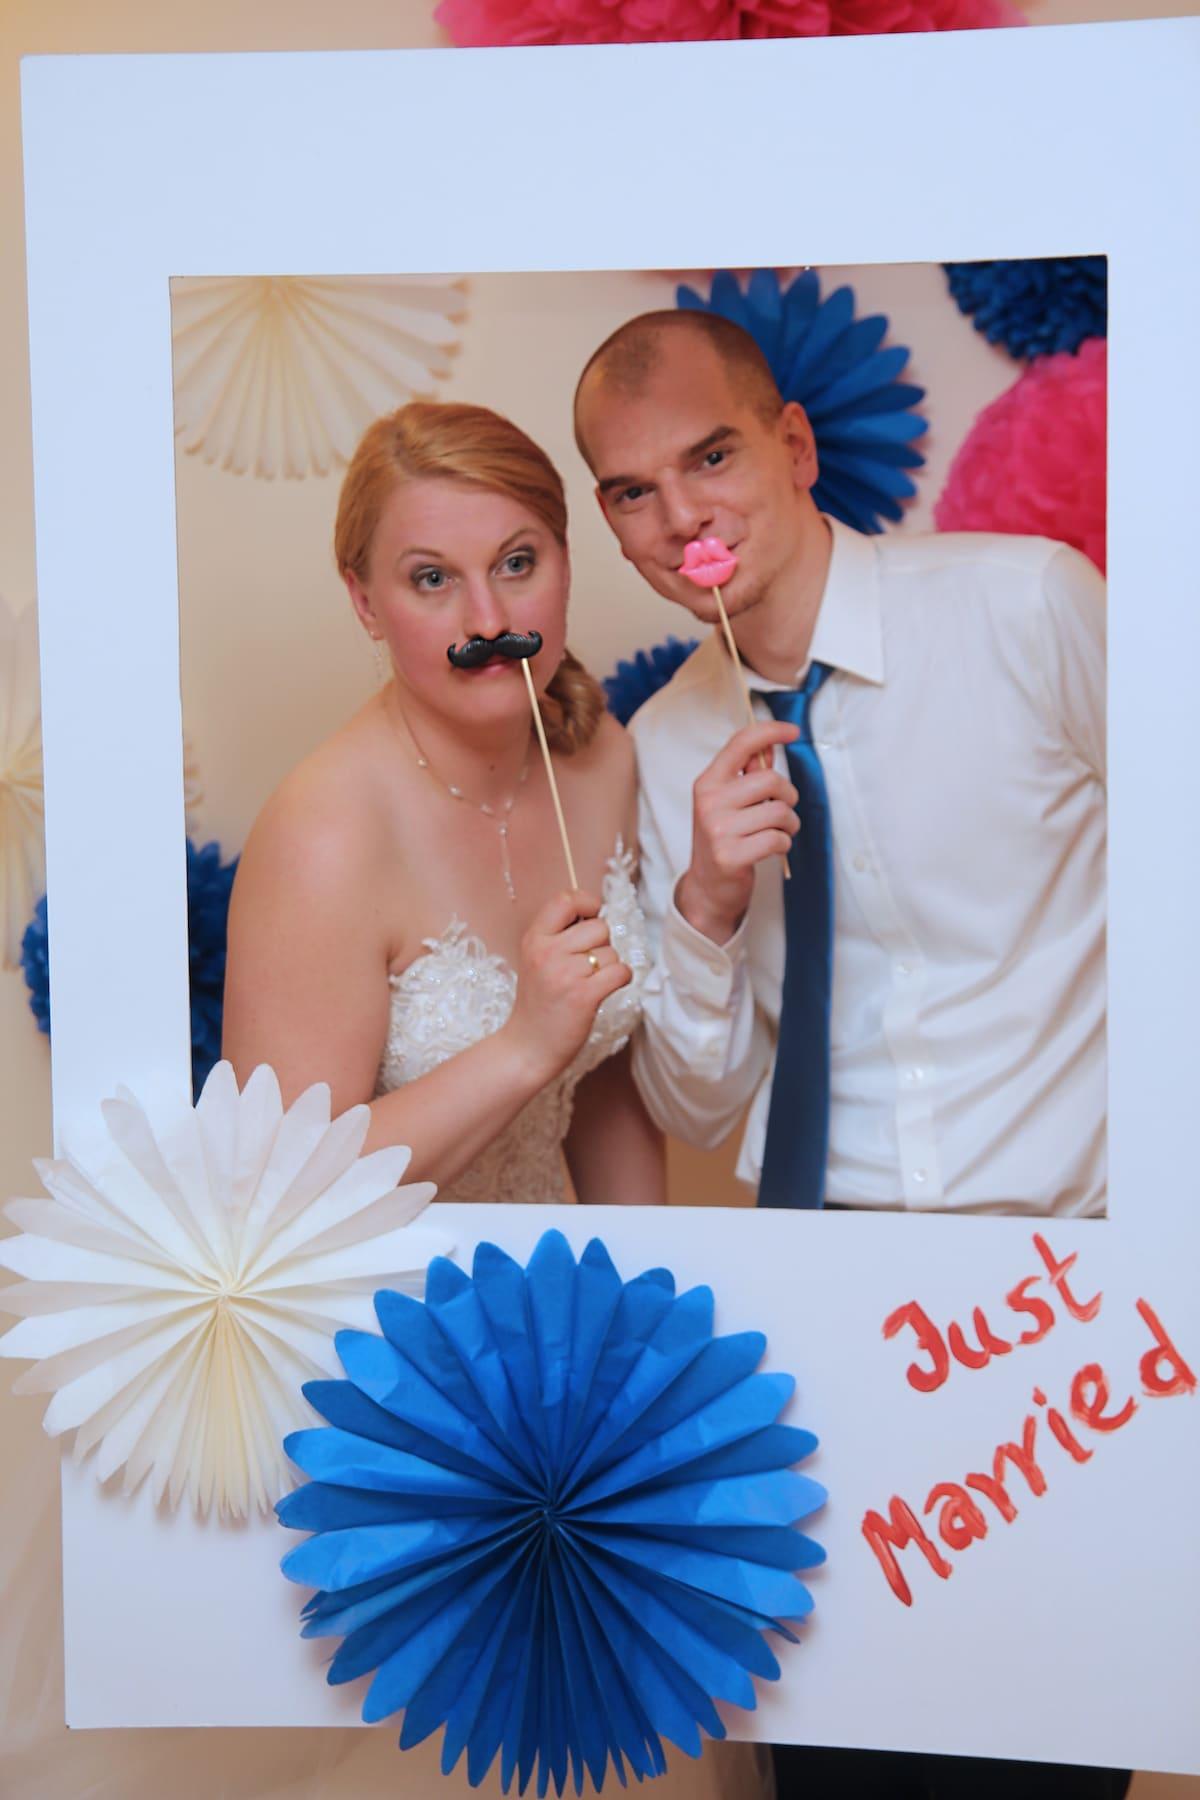 Anna&Uwe from Hanover